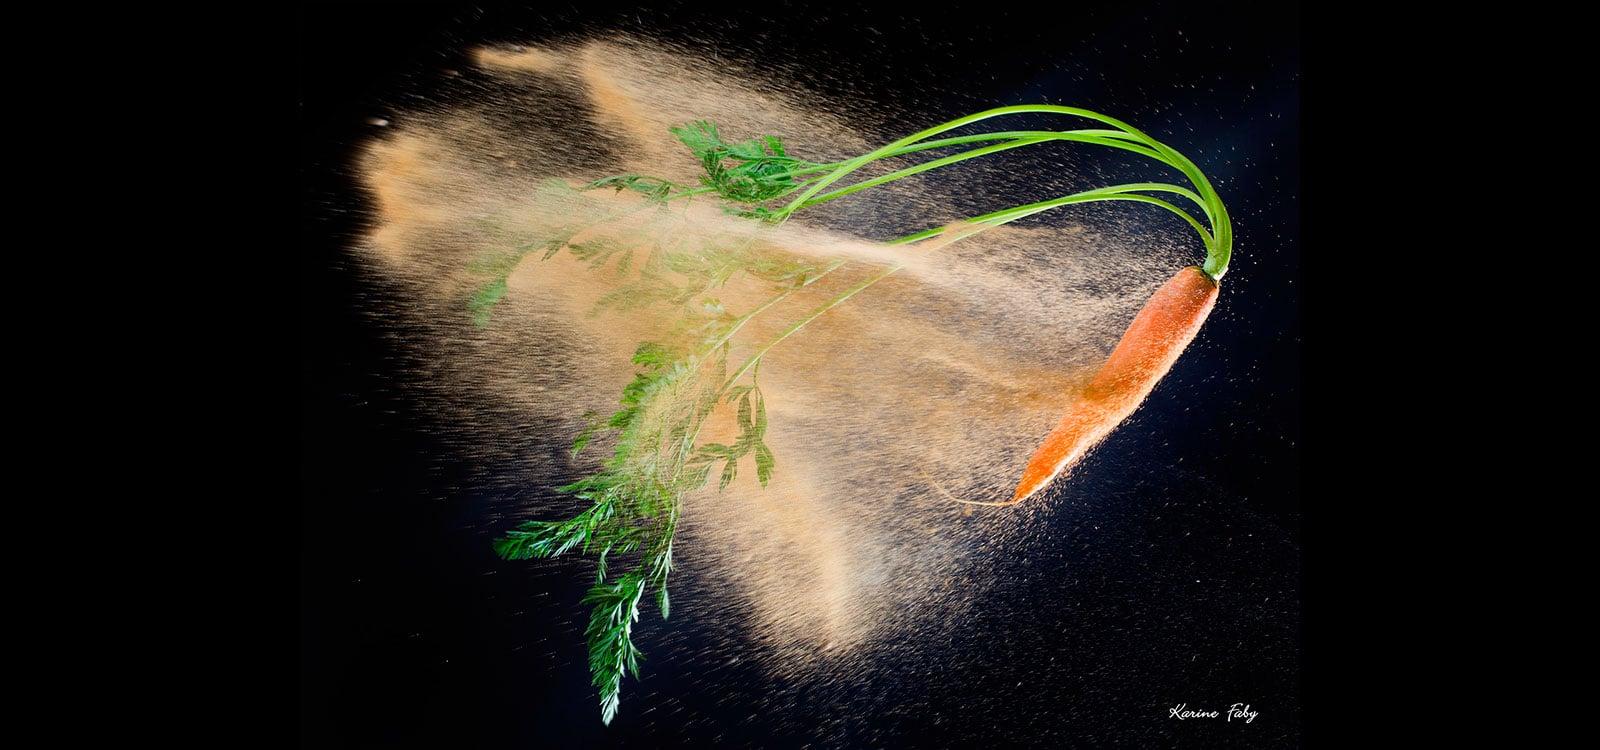 Karine-Faby_ Carotte explosion